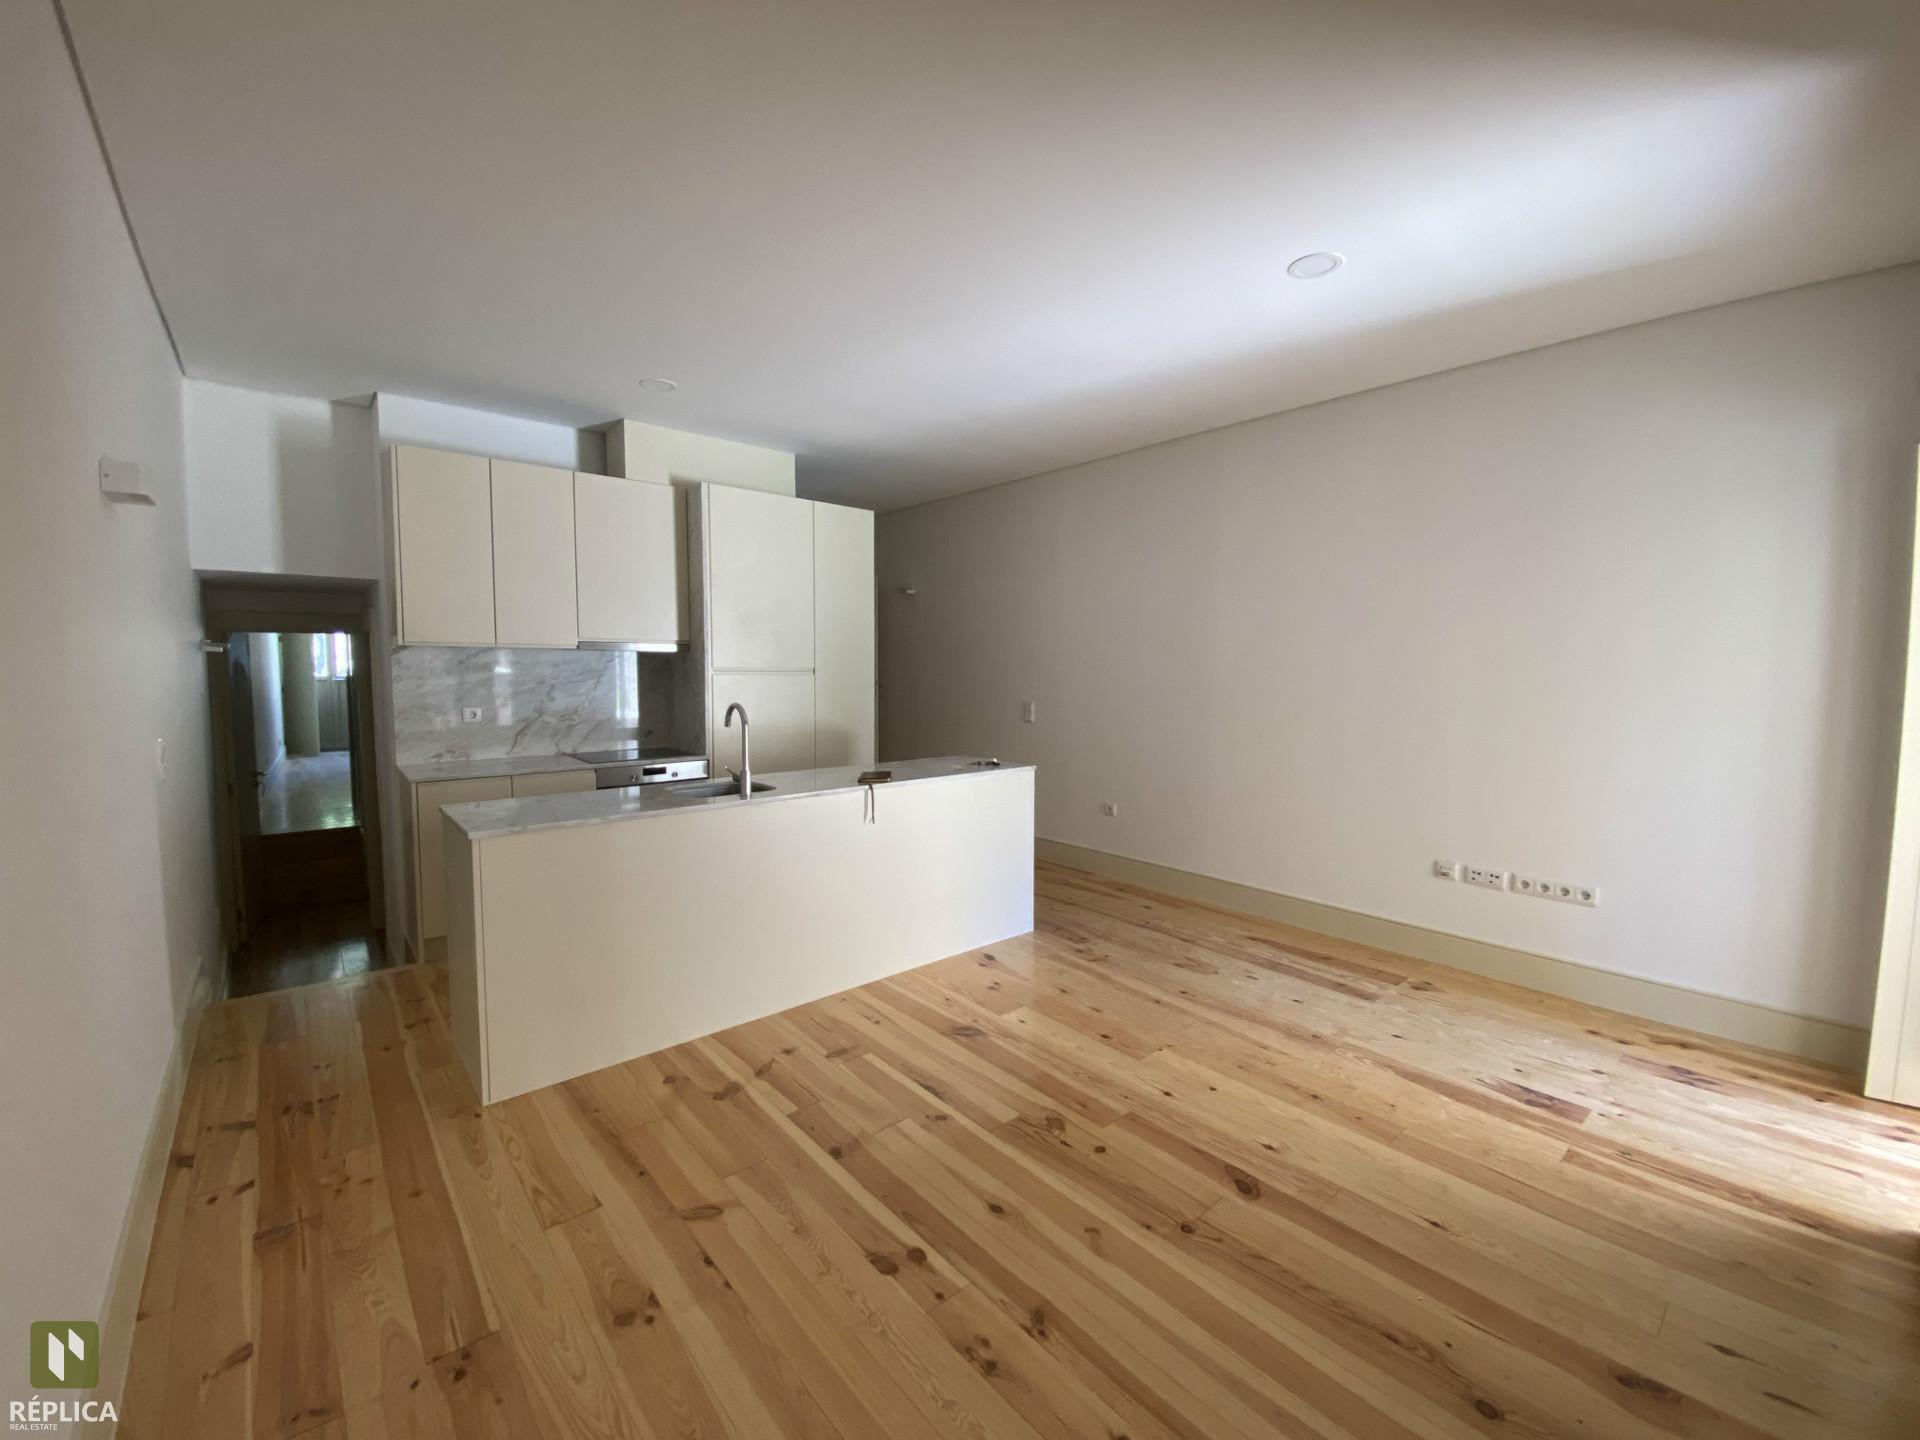 Appartement 2 Chambre(s) Kitchenette